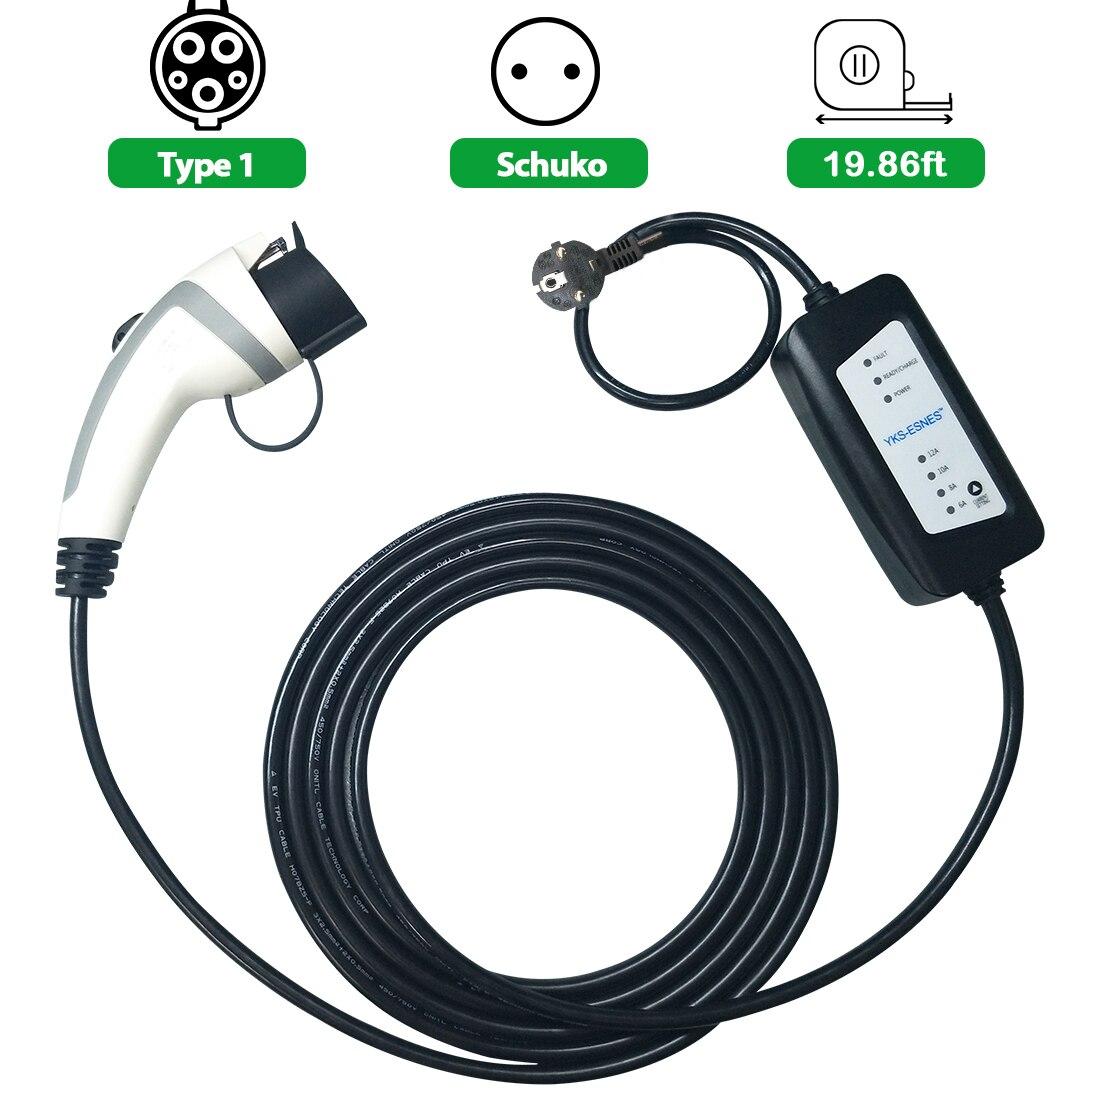 YKS-ESNES  Portable EV Charger SAE J1772  16A  EU Standard Plug  5M  Evse Type 1